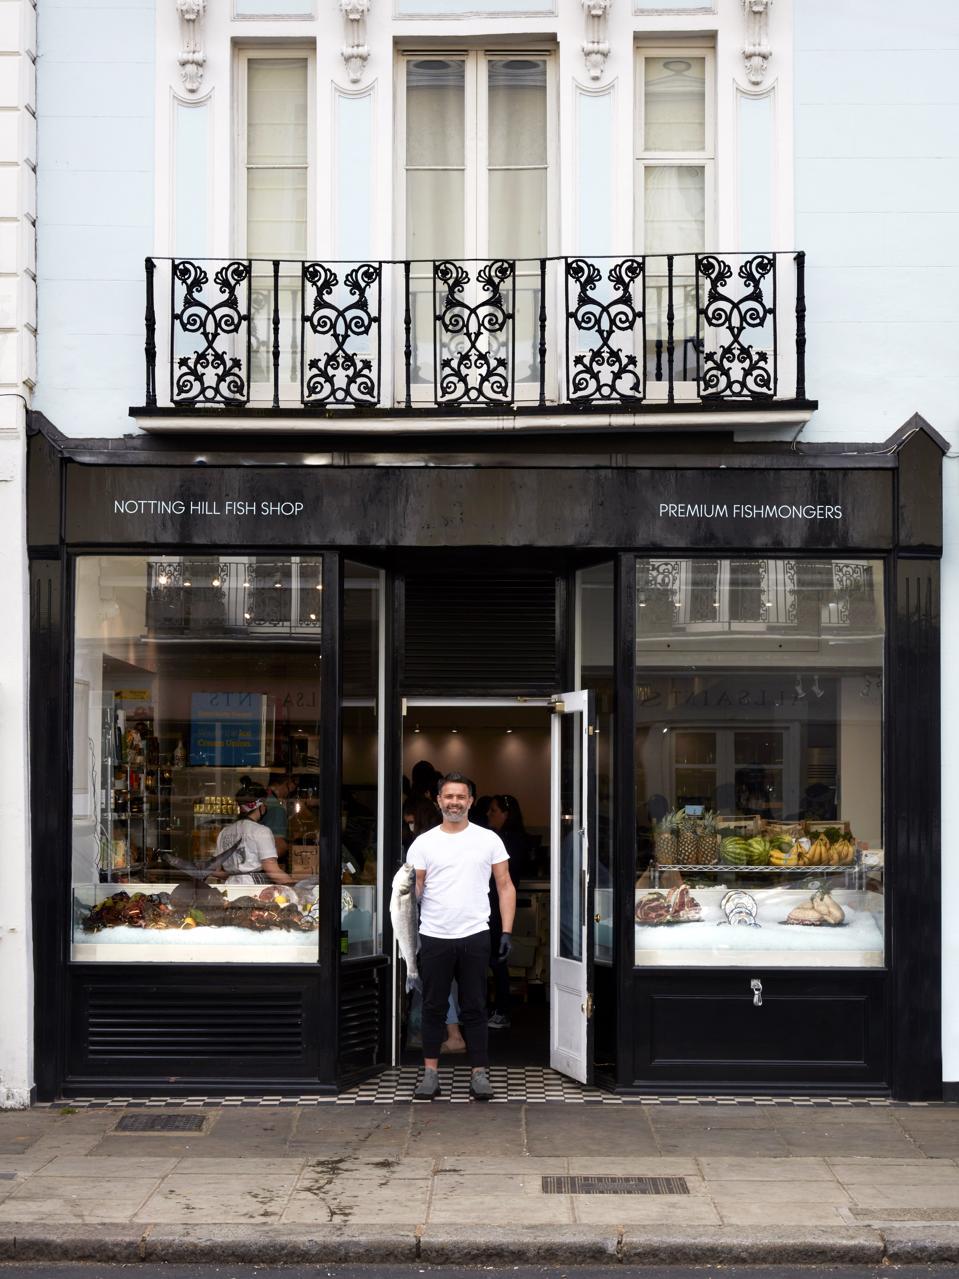 Chris D'Sylva, owner of The Notting Hill Fish Shop